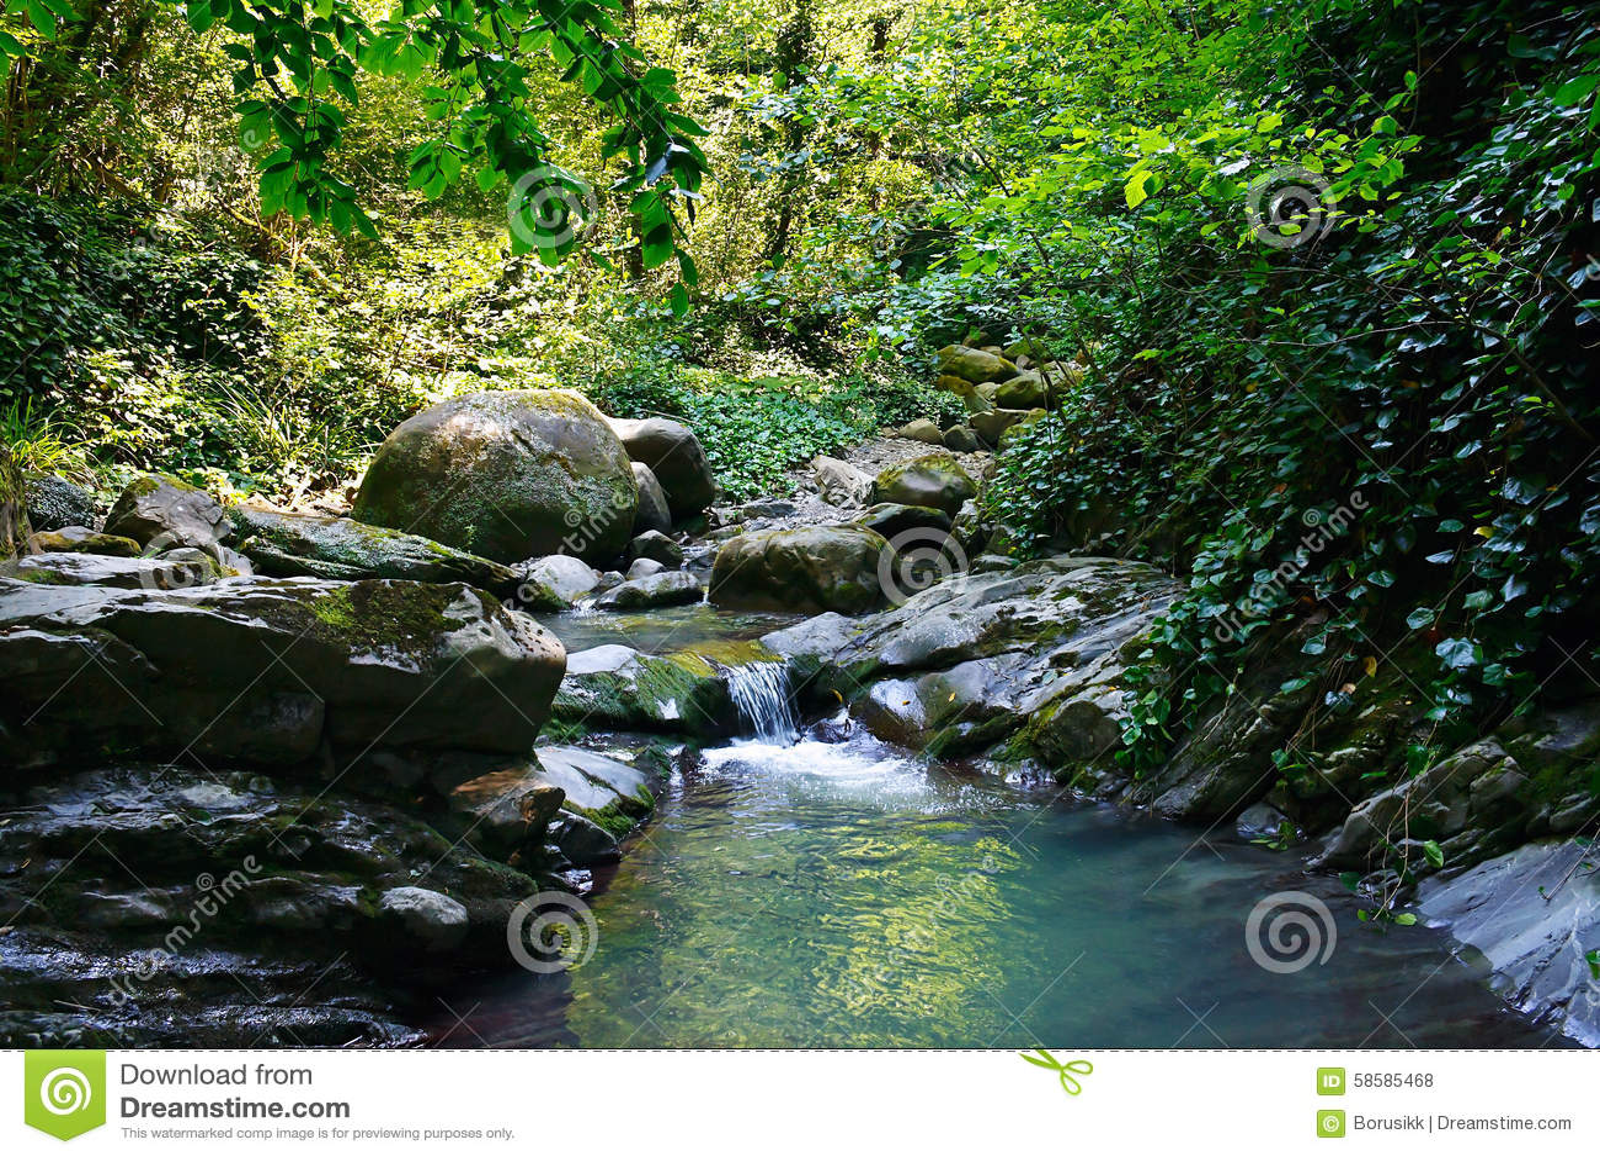 Stream of harmony 48